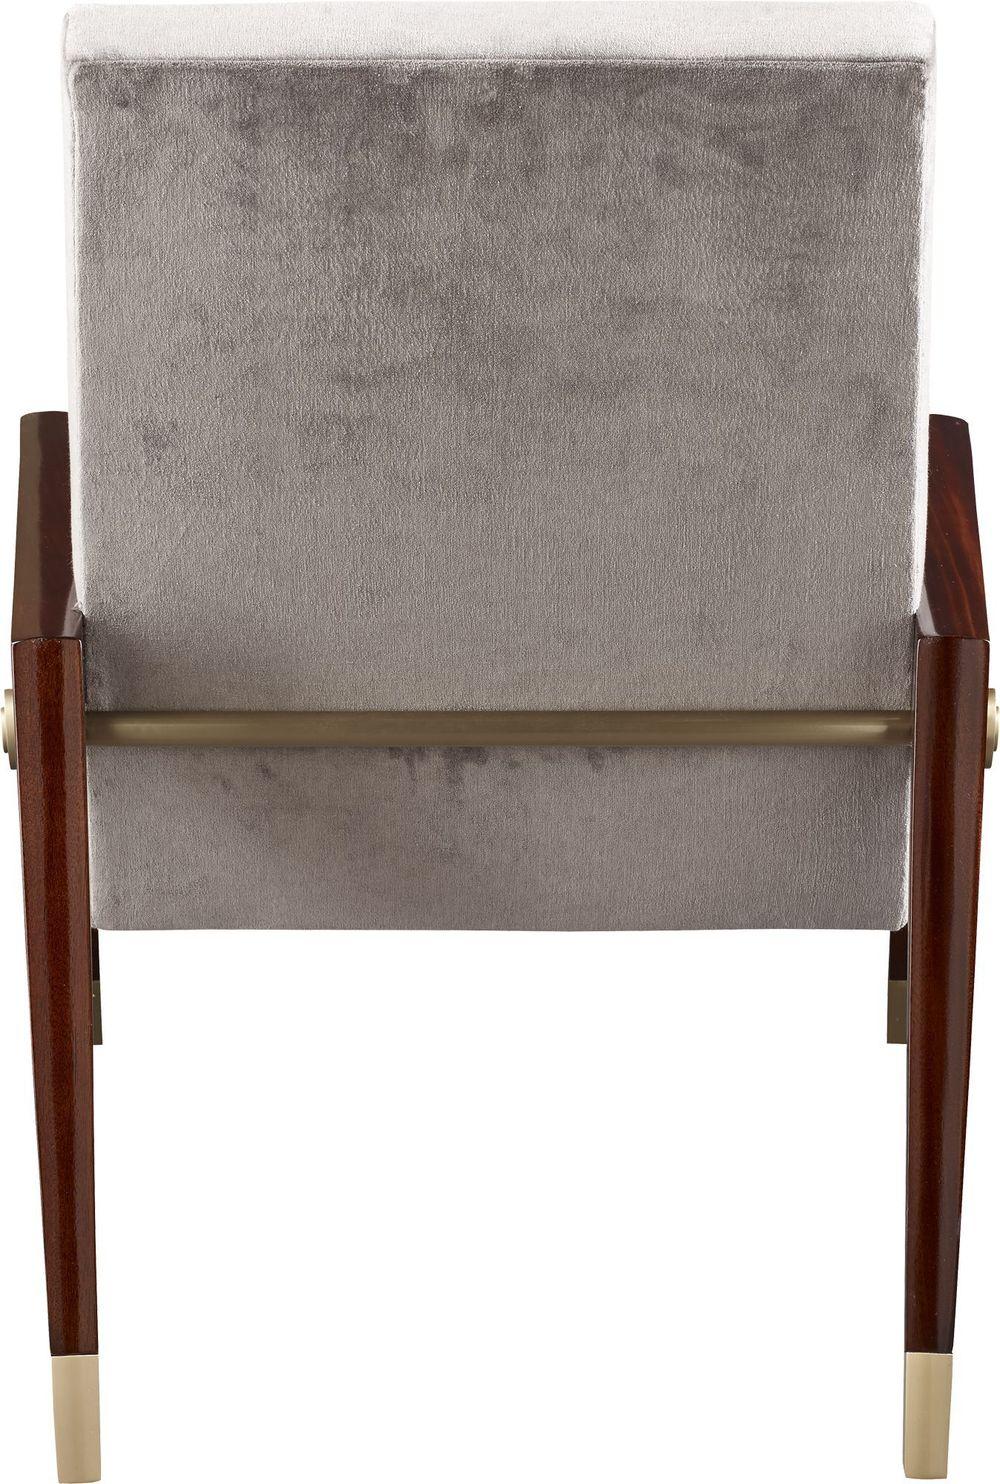 Baker Furniture - Sling Lounge Chair